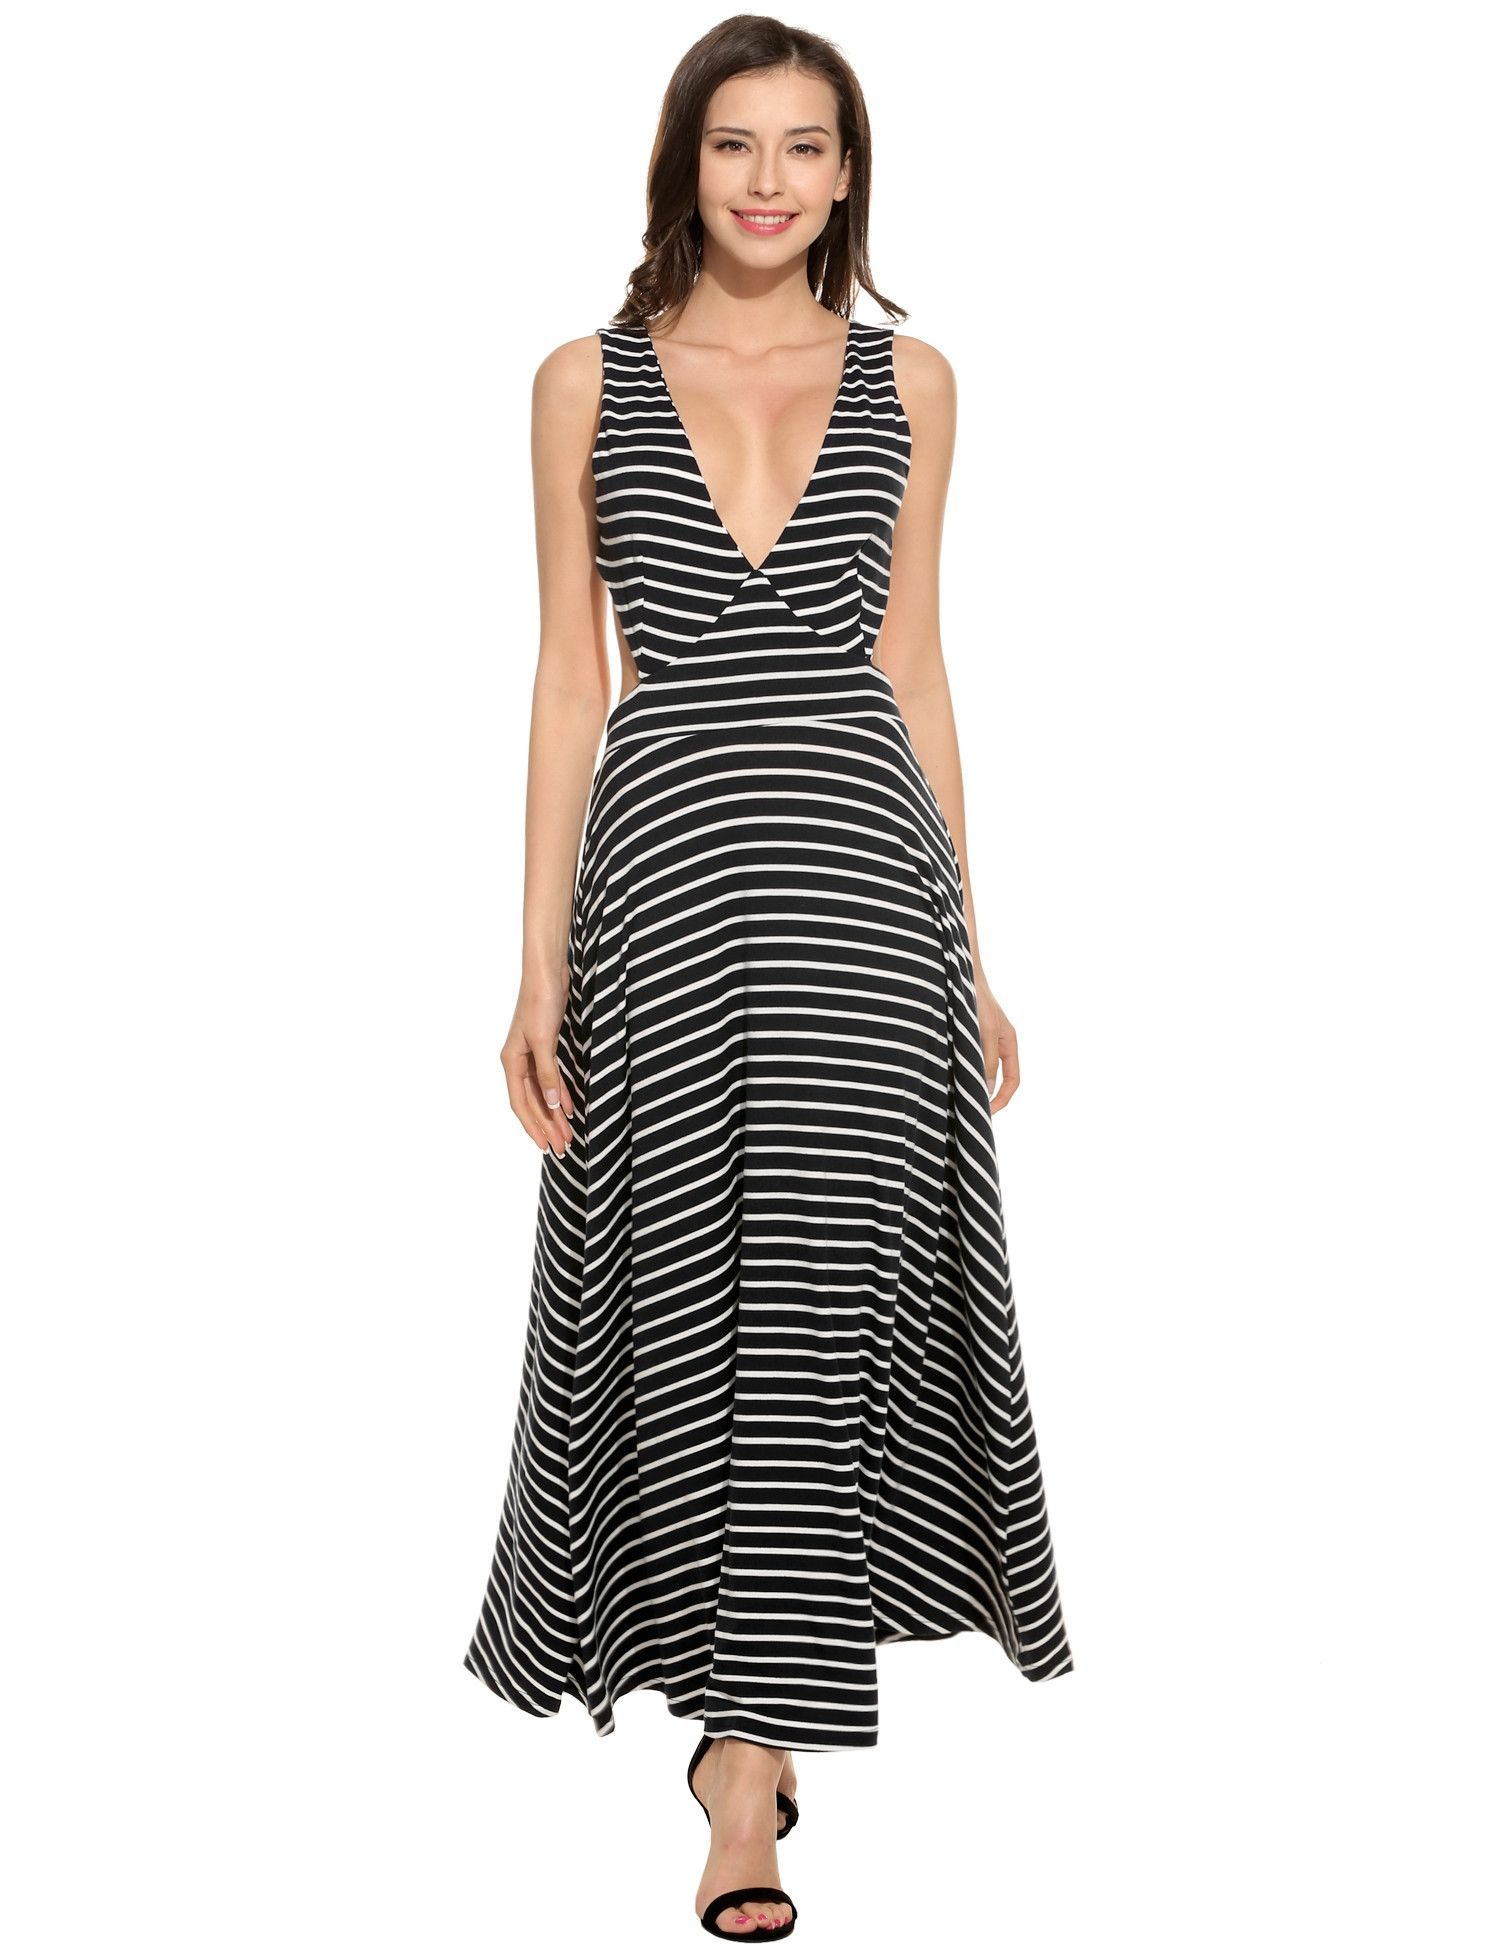 9049ade175 Navy blue Women Casual V-Neck Sleeveless Striped Pleated Backless Elastic  Tank Beach Maxi Dress